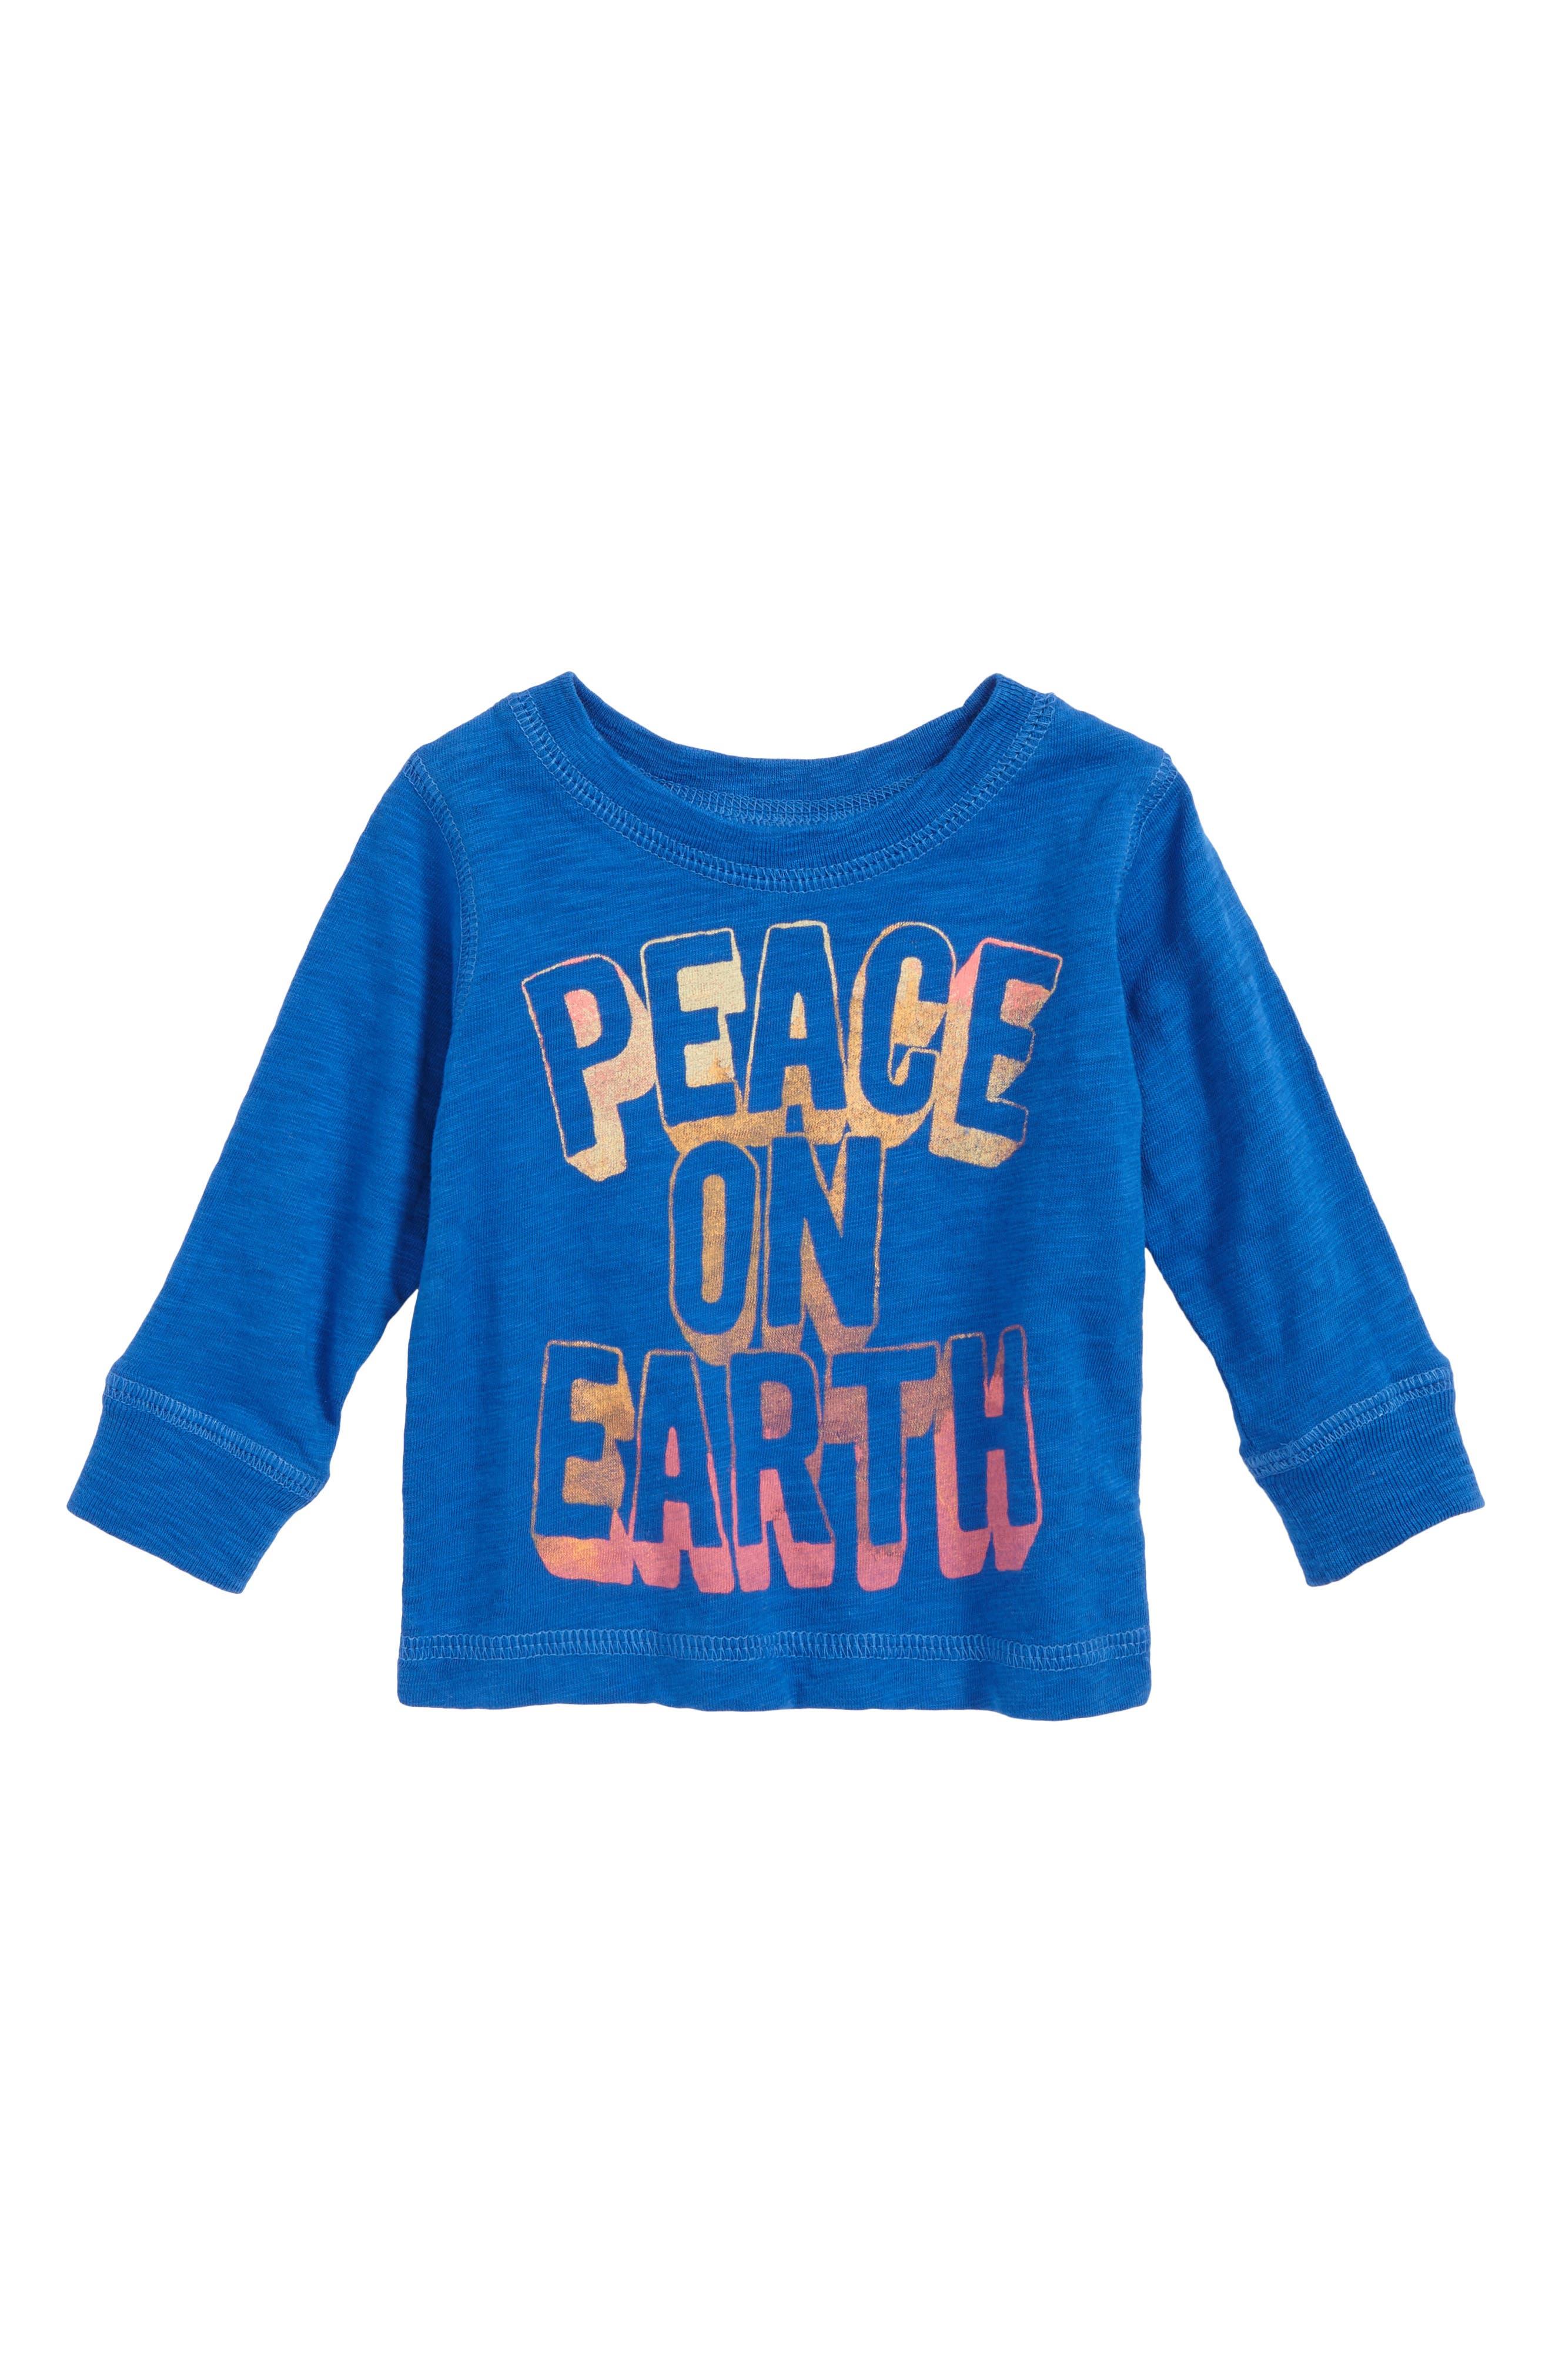 Peek Peace on Earth T-Shirt,                         Main,                         color, 410